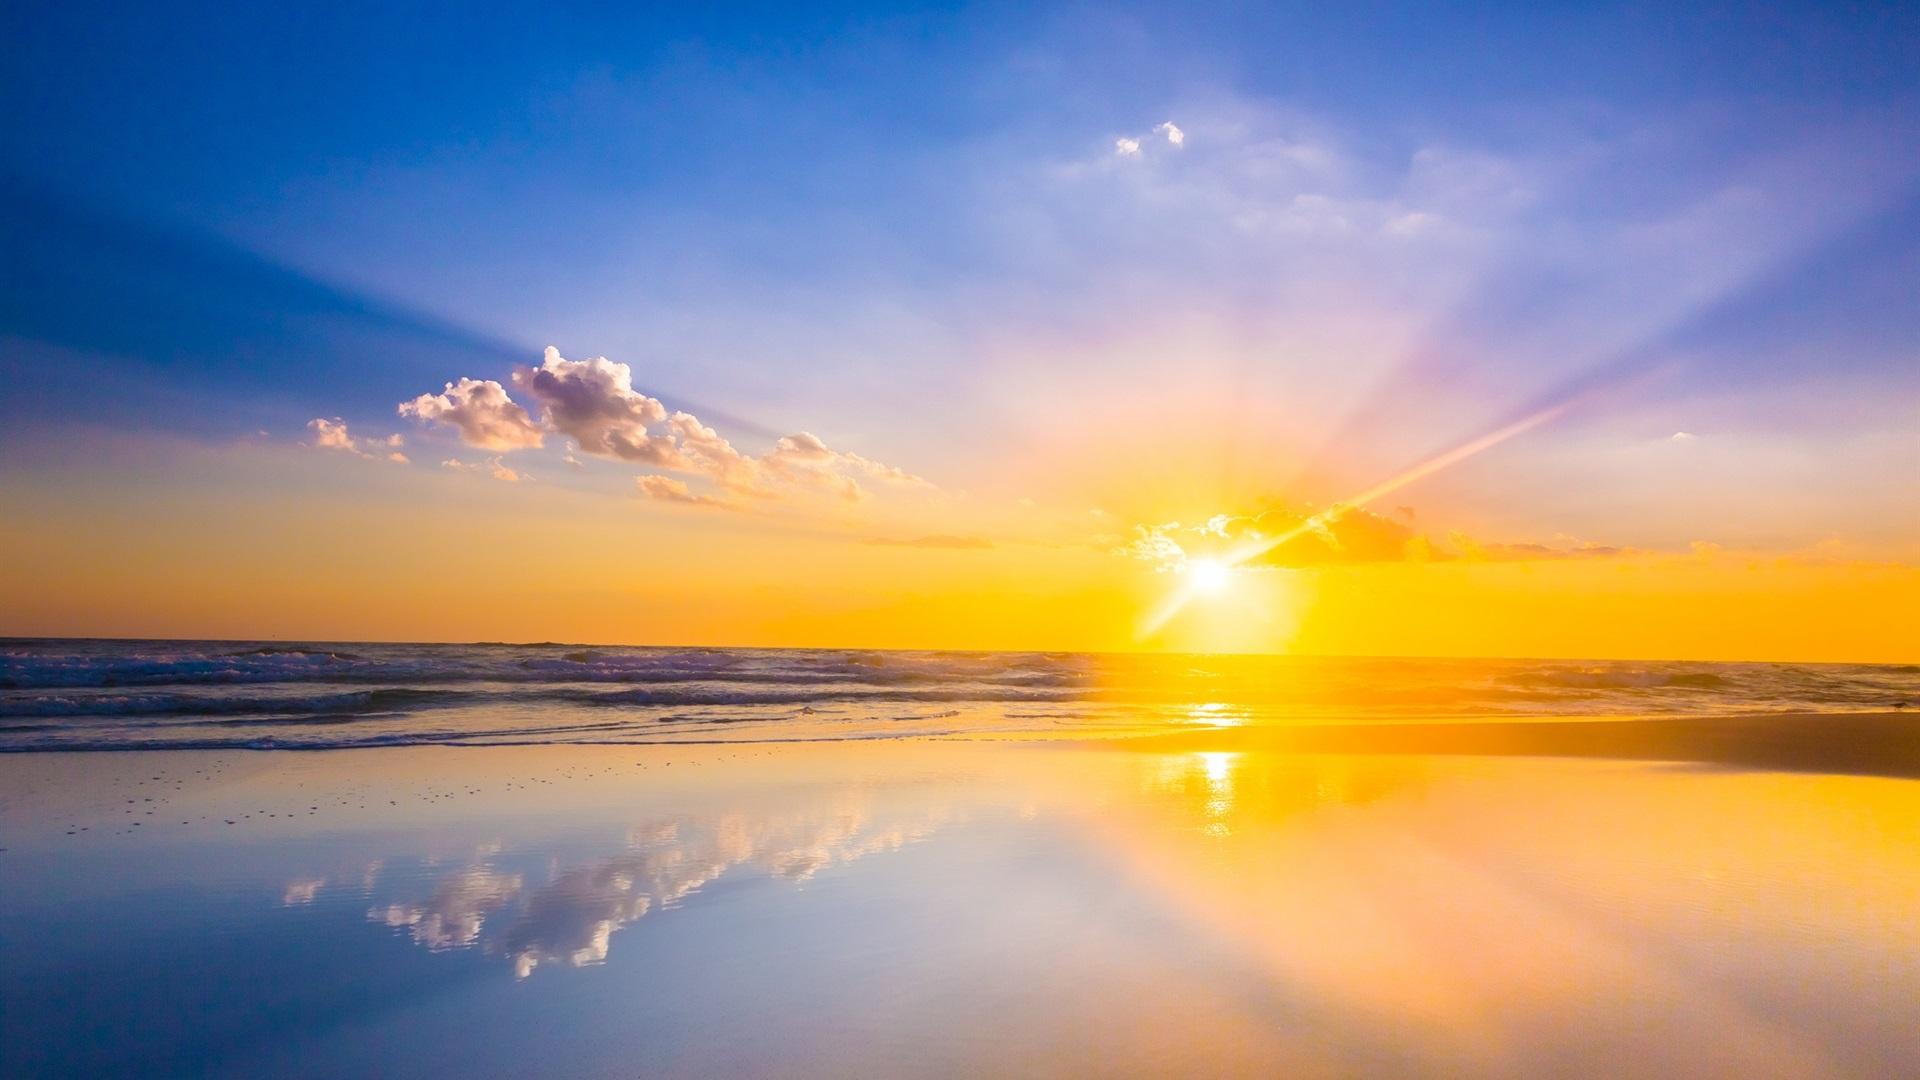 1080 x 1920 alucard wallpaper: 壁紙 日の出、海、ビーチ、雲、空 1920x1200 HD 無料のデスクトップの背景, 画像